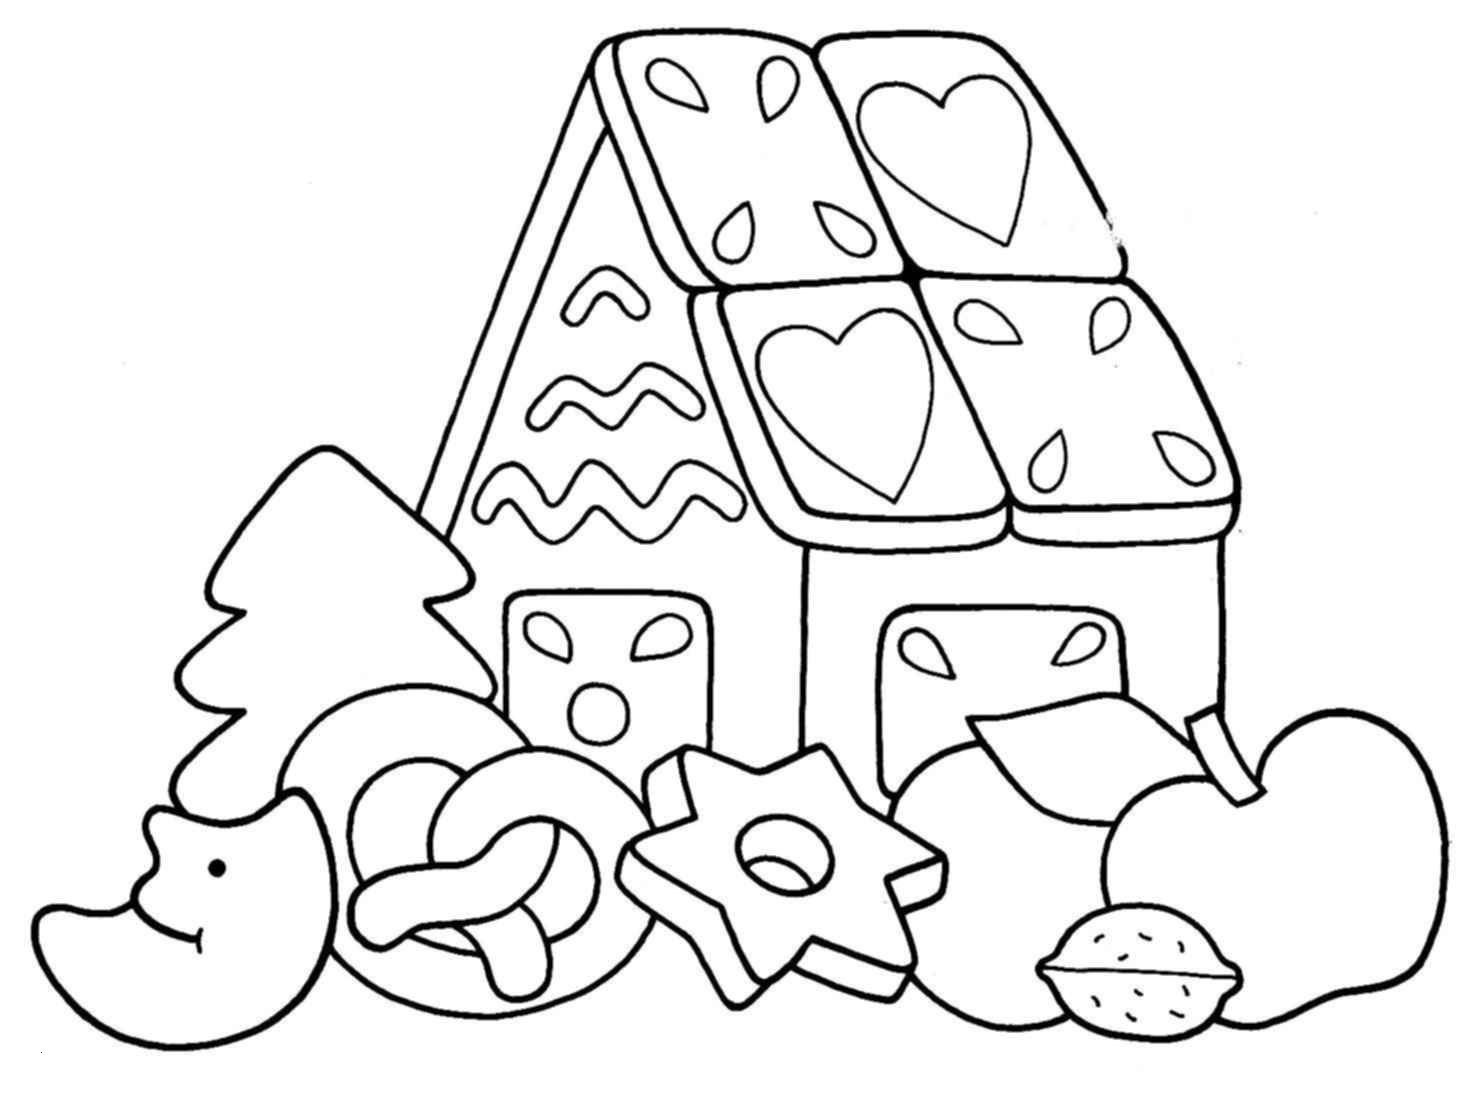 Micky Maus Baby Ausmalbilder Genial 37 Ausmalbilder Minni Maus Scoredatscore Inspirierend Micky Maus Das Bild